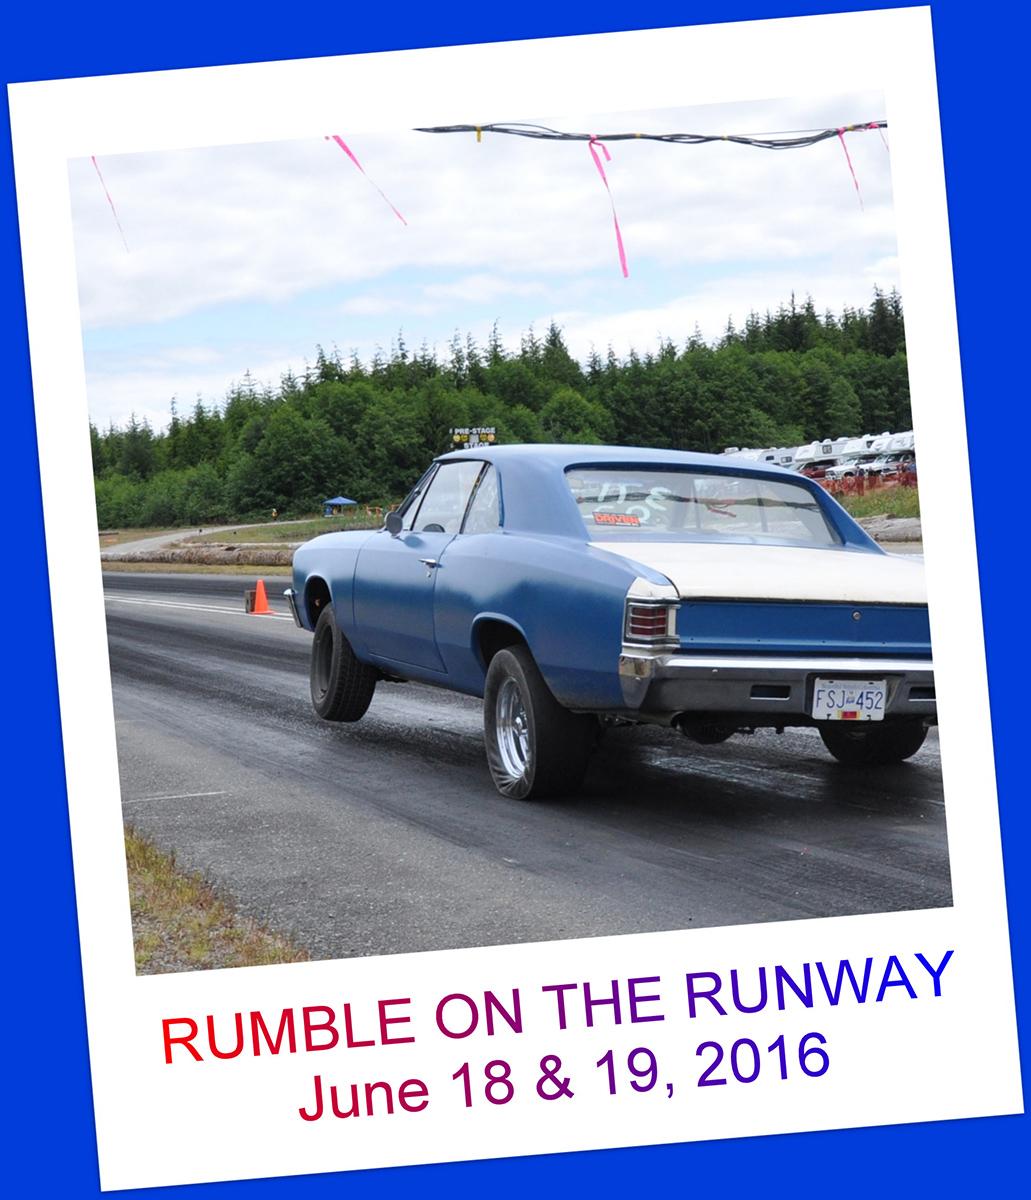 Rumble on the Runway June 18 & 19, 2016 504